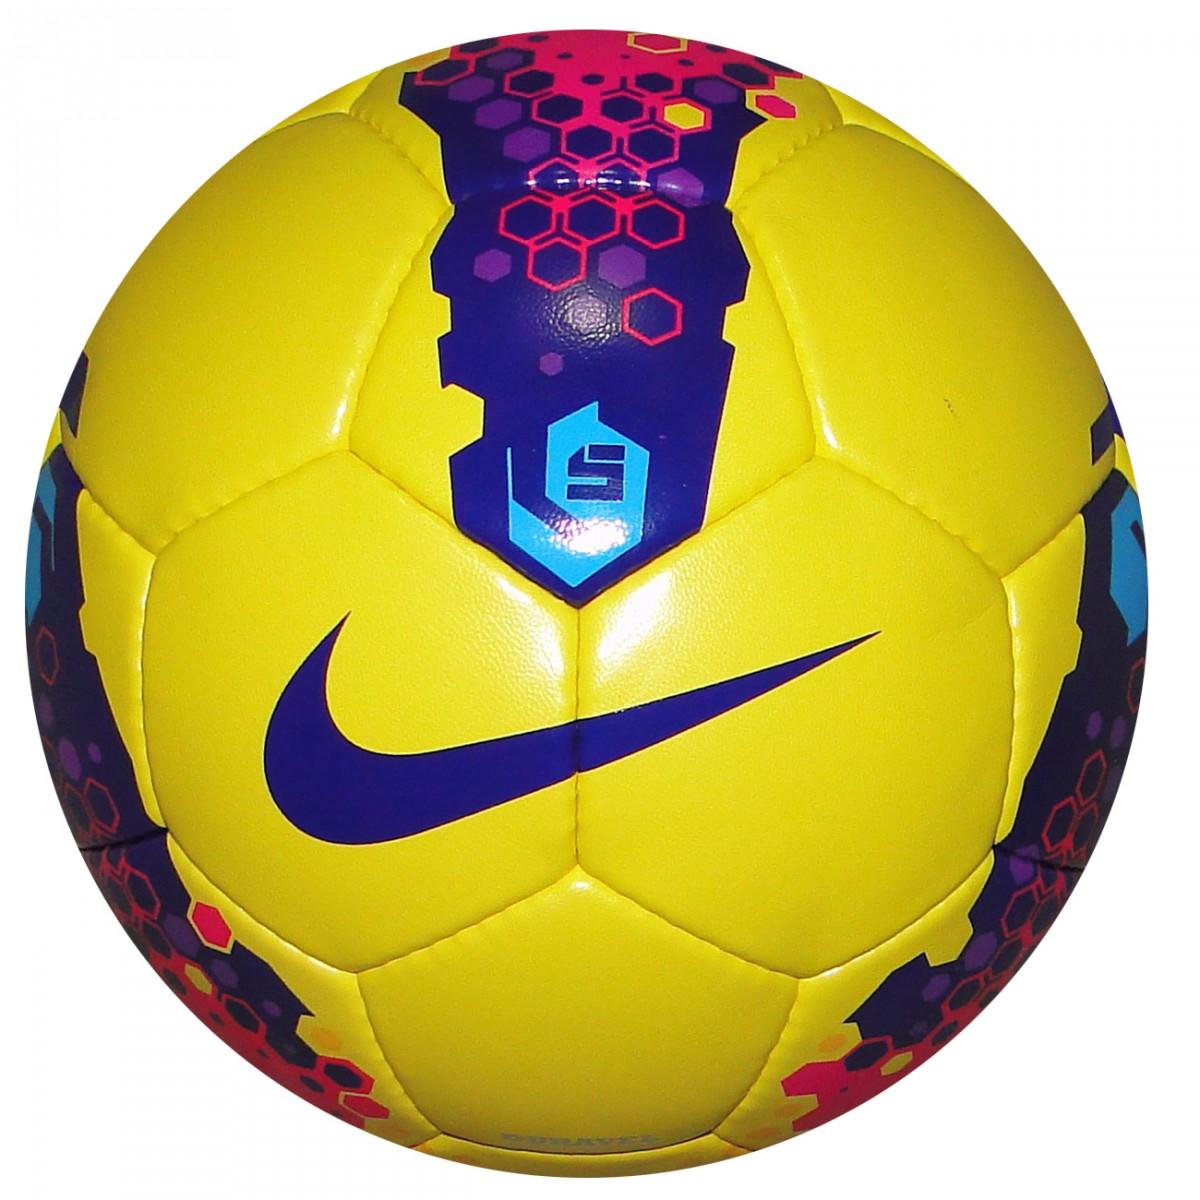 Snap Bola Futebol Nike Rolinho Duravel Gamaia photos on Pinterest c158c425b5bcf